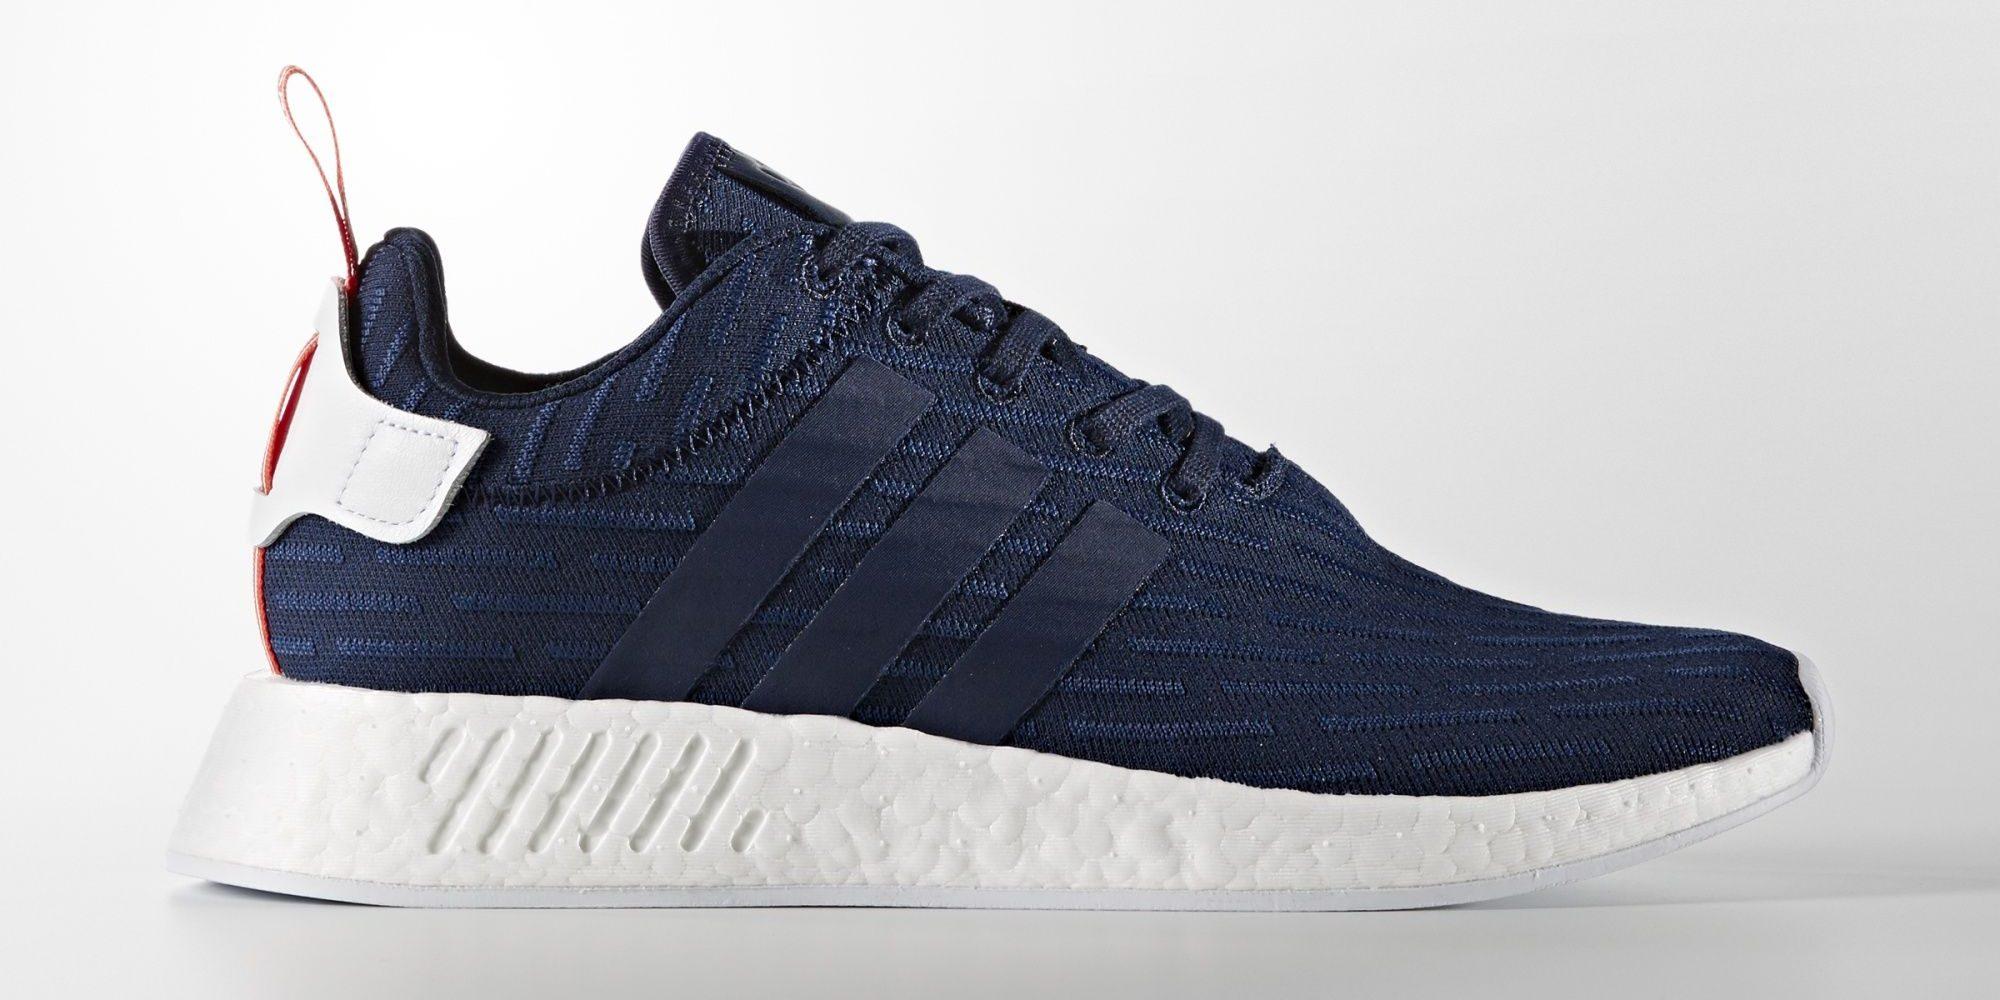 Adidas nmd xr1 Donna 2014 cheap >off69% più grande catalogo sconti